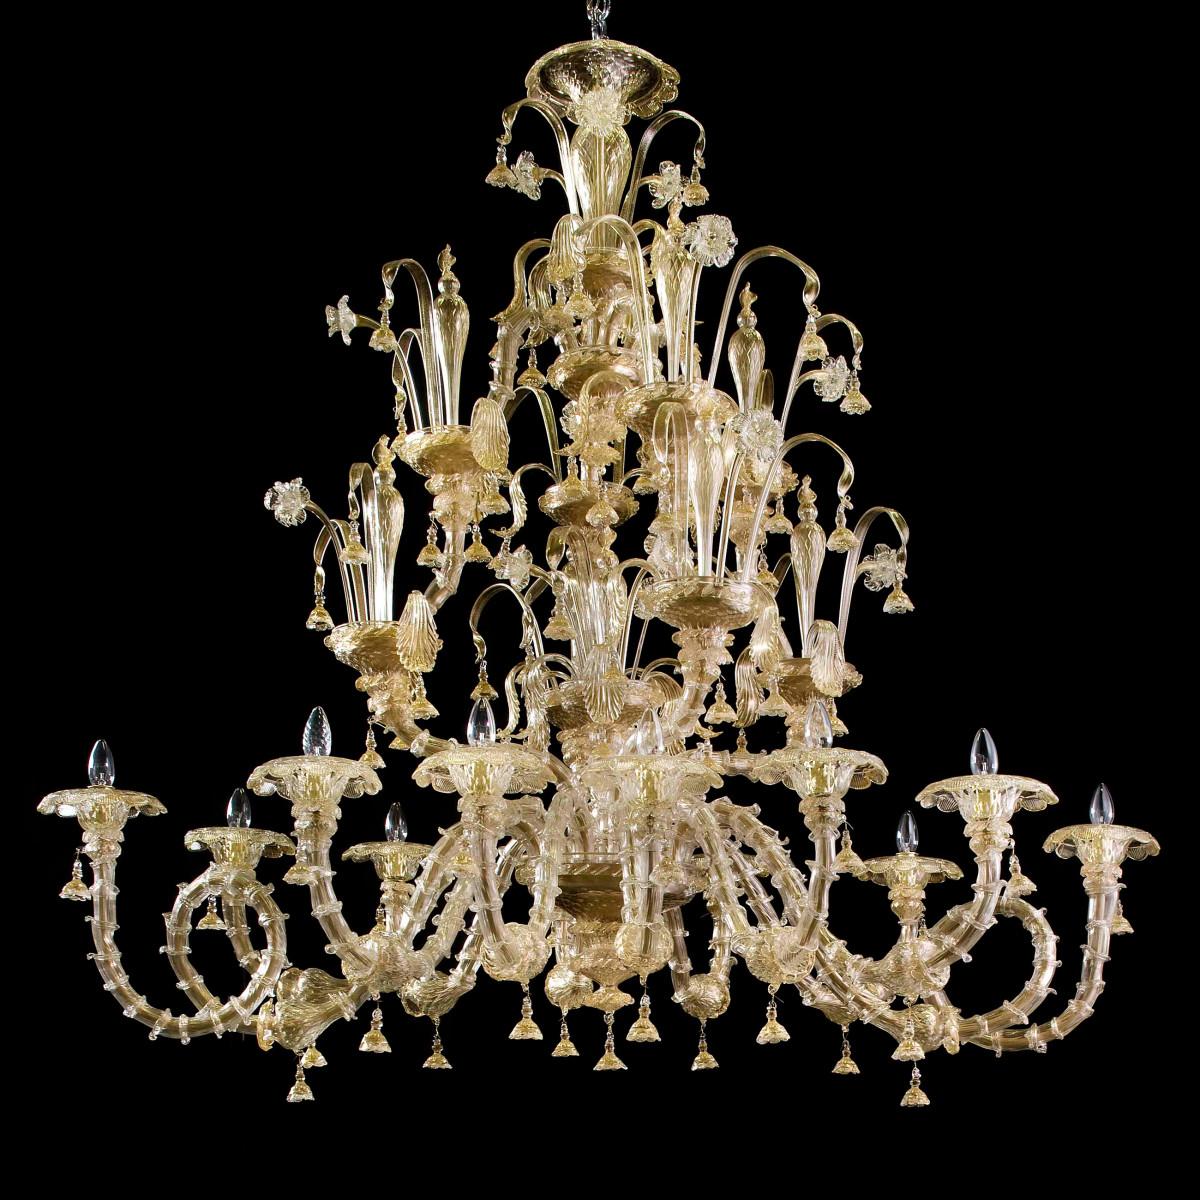 Magnifico 12 luces araña de Murano - forma oval - color oro